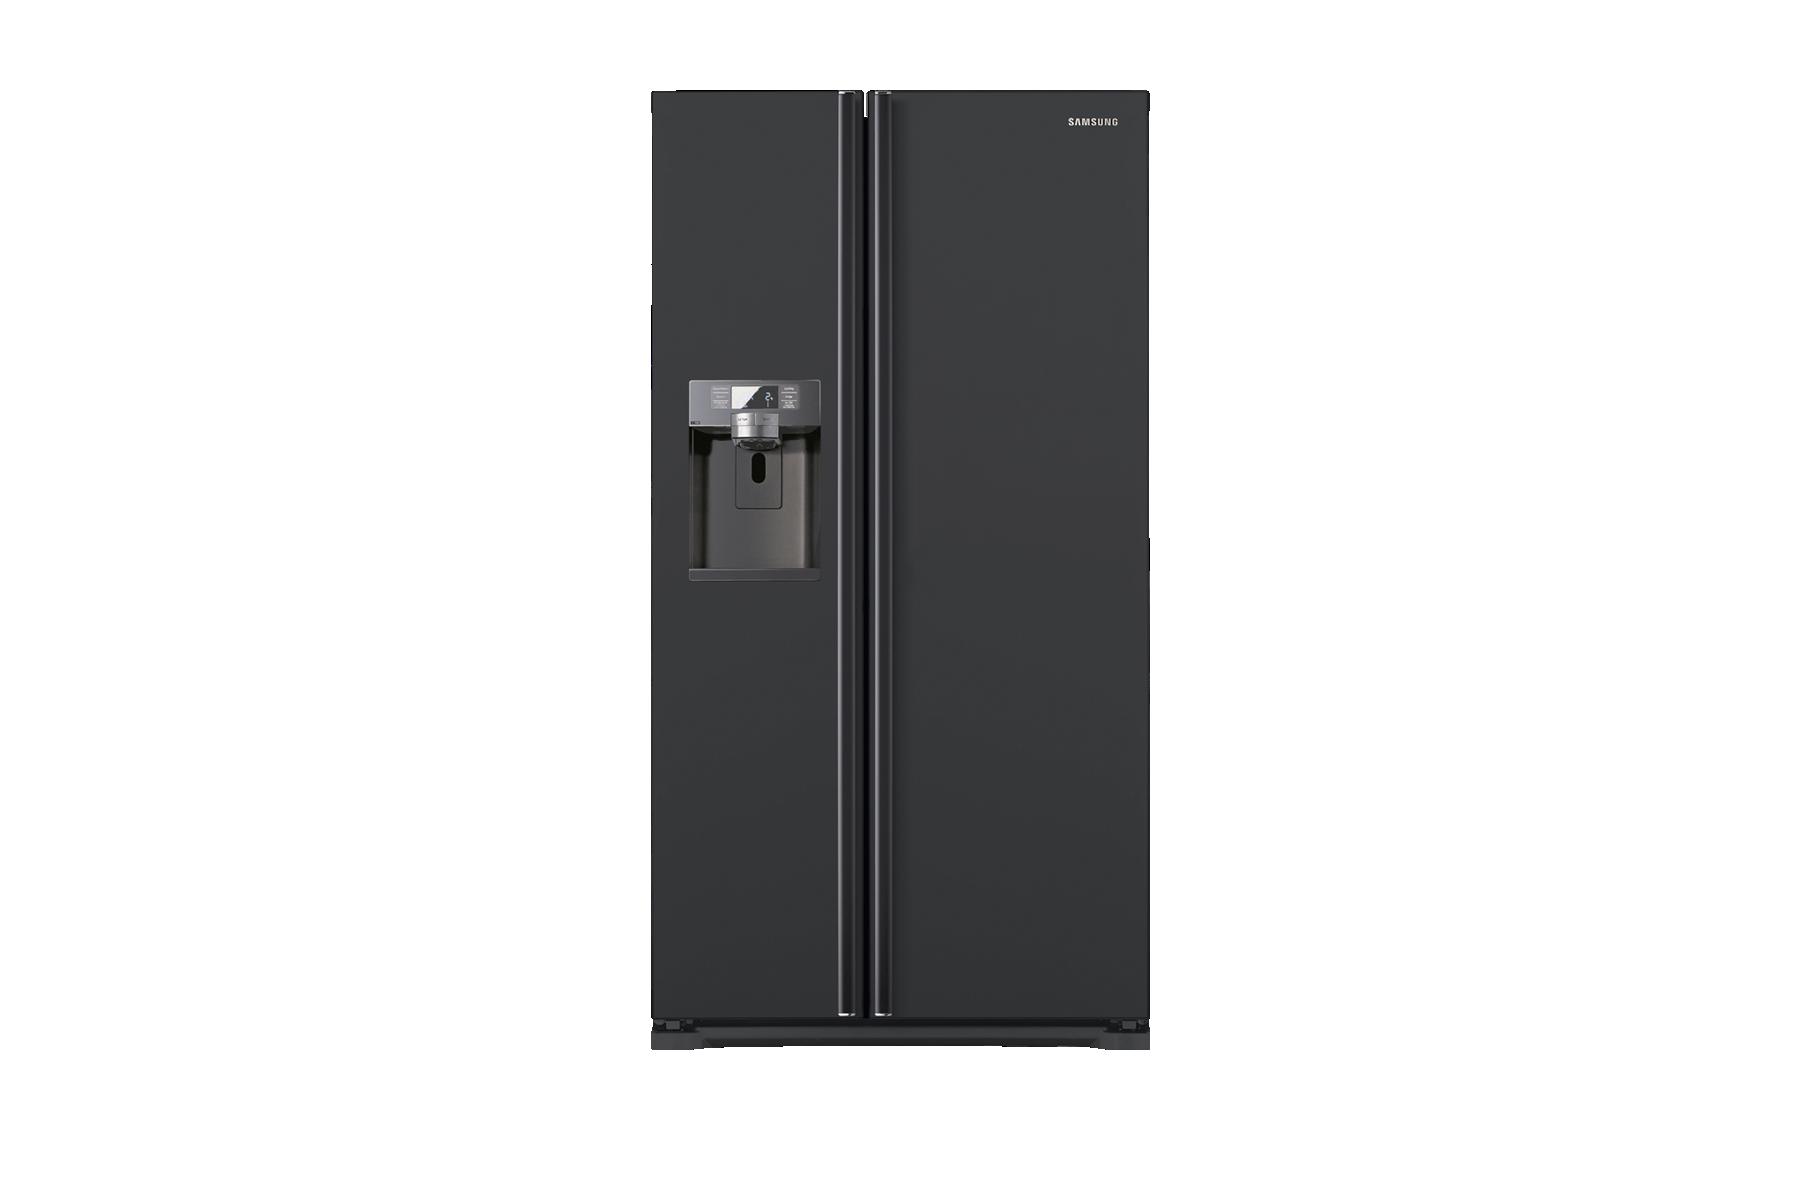 RSG5UUMH RSG5UUMH G-Series American Style Fridge Freezer